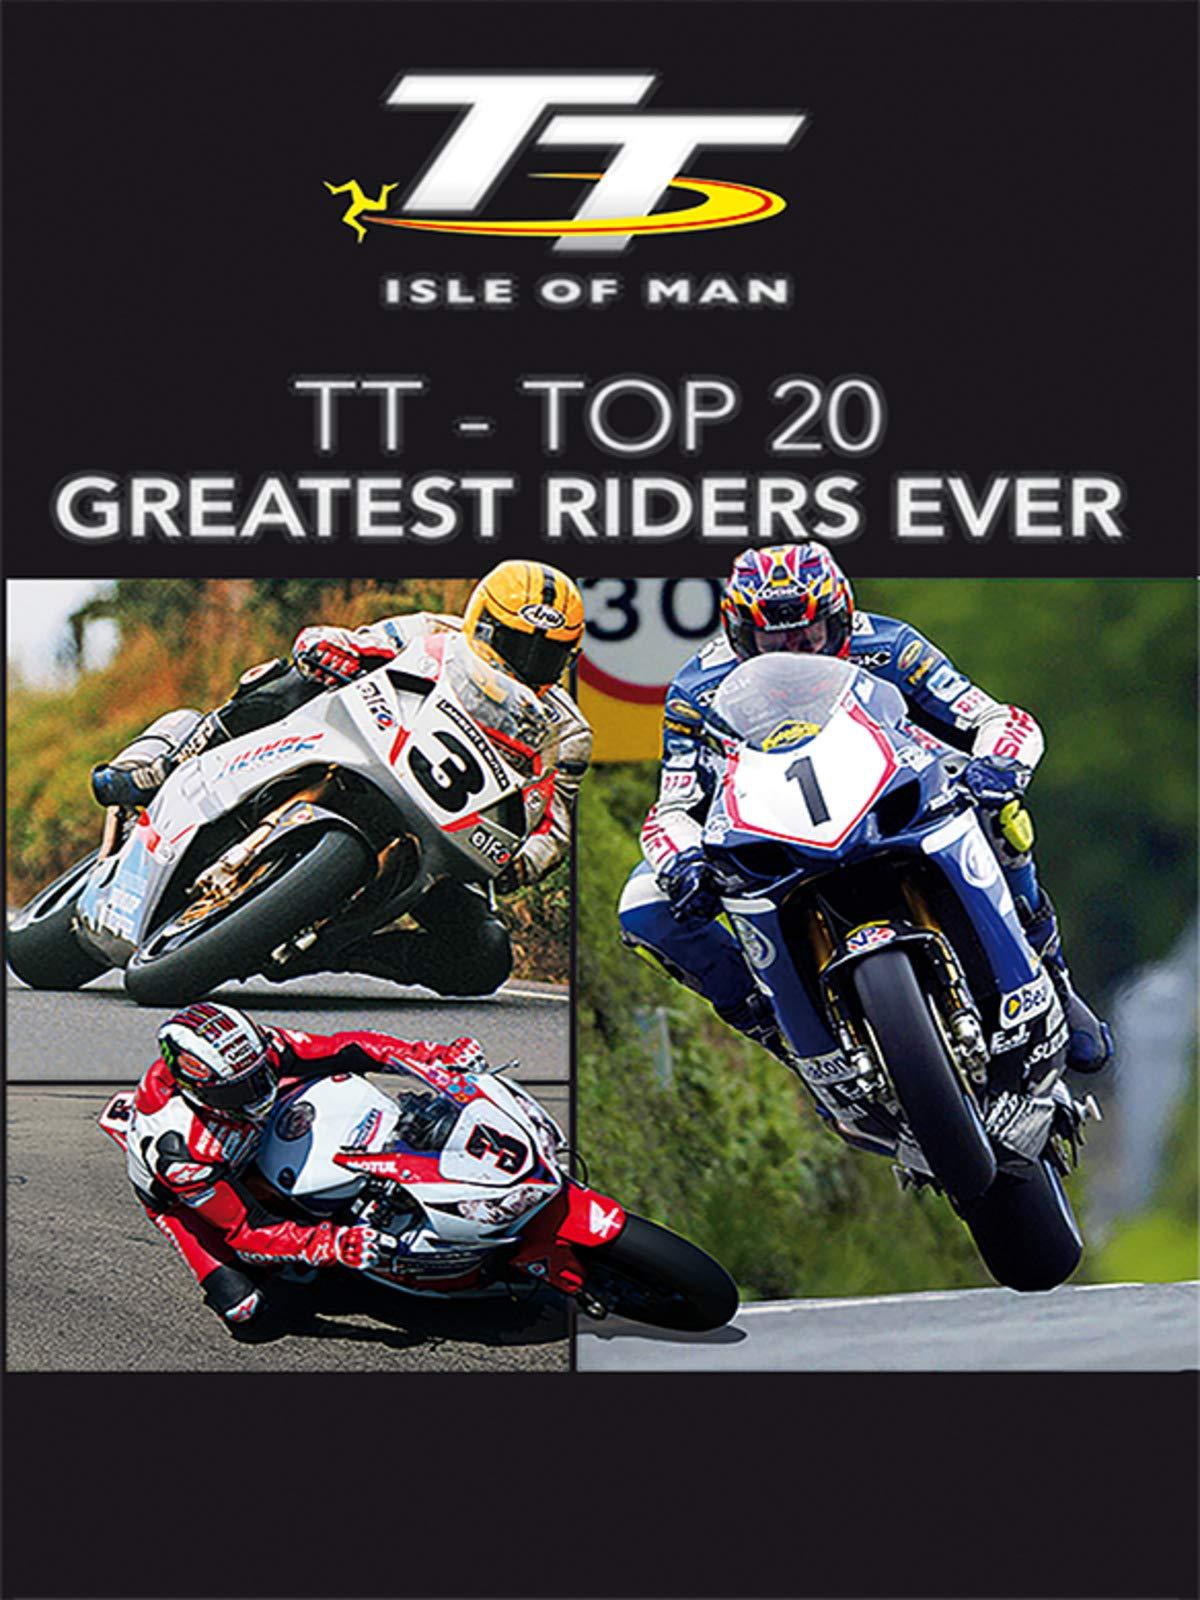 TT: Top 20 Greatest Riders Ever